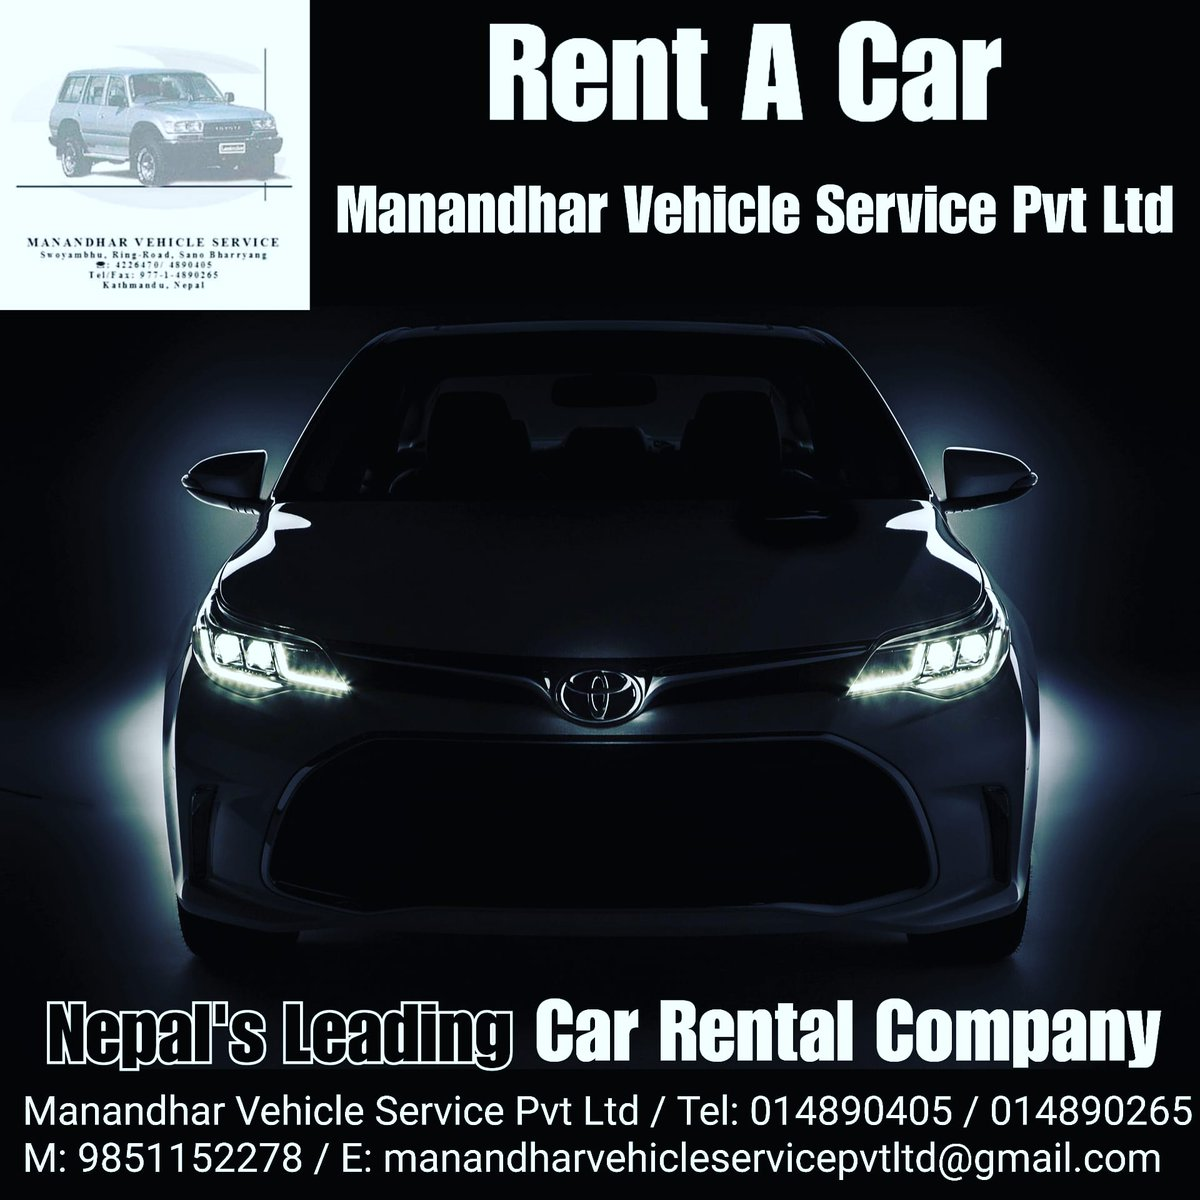 Manandhar Vehicle Service Pvt Ltd Nepal's Leading Car Rental Company Phone: 9851152278  #rentacar #rental #rentalbusiness #rent #kathmandu #Nepal https://t.co/t3RsM7ezKj